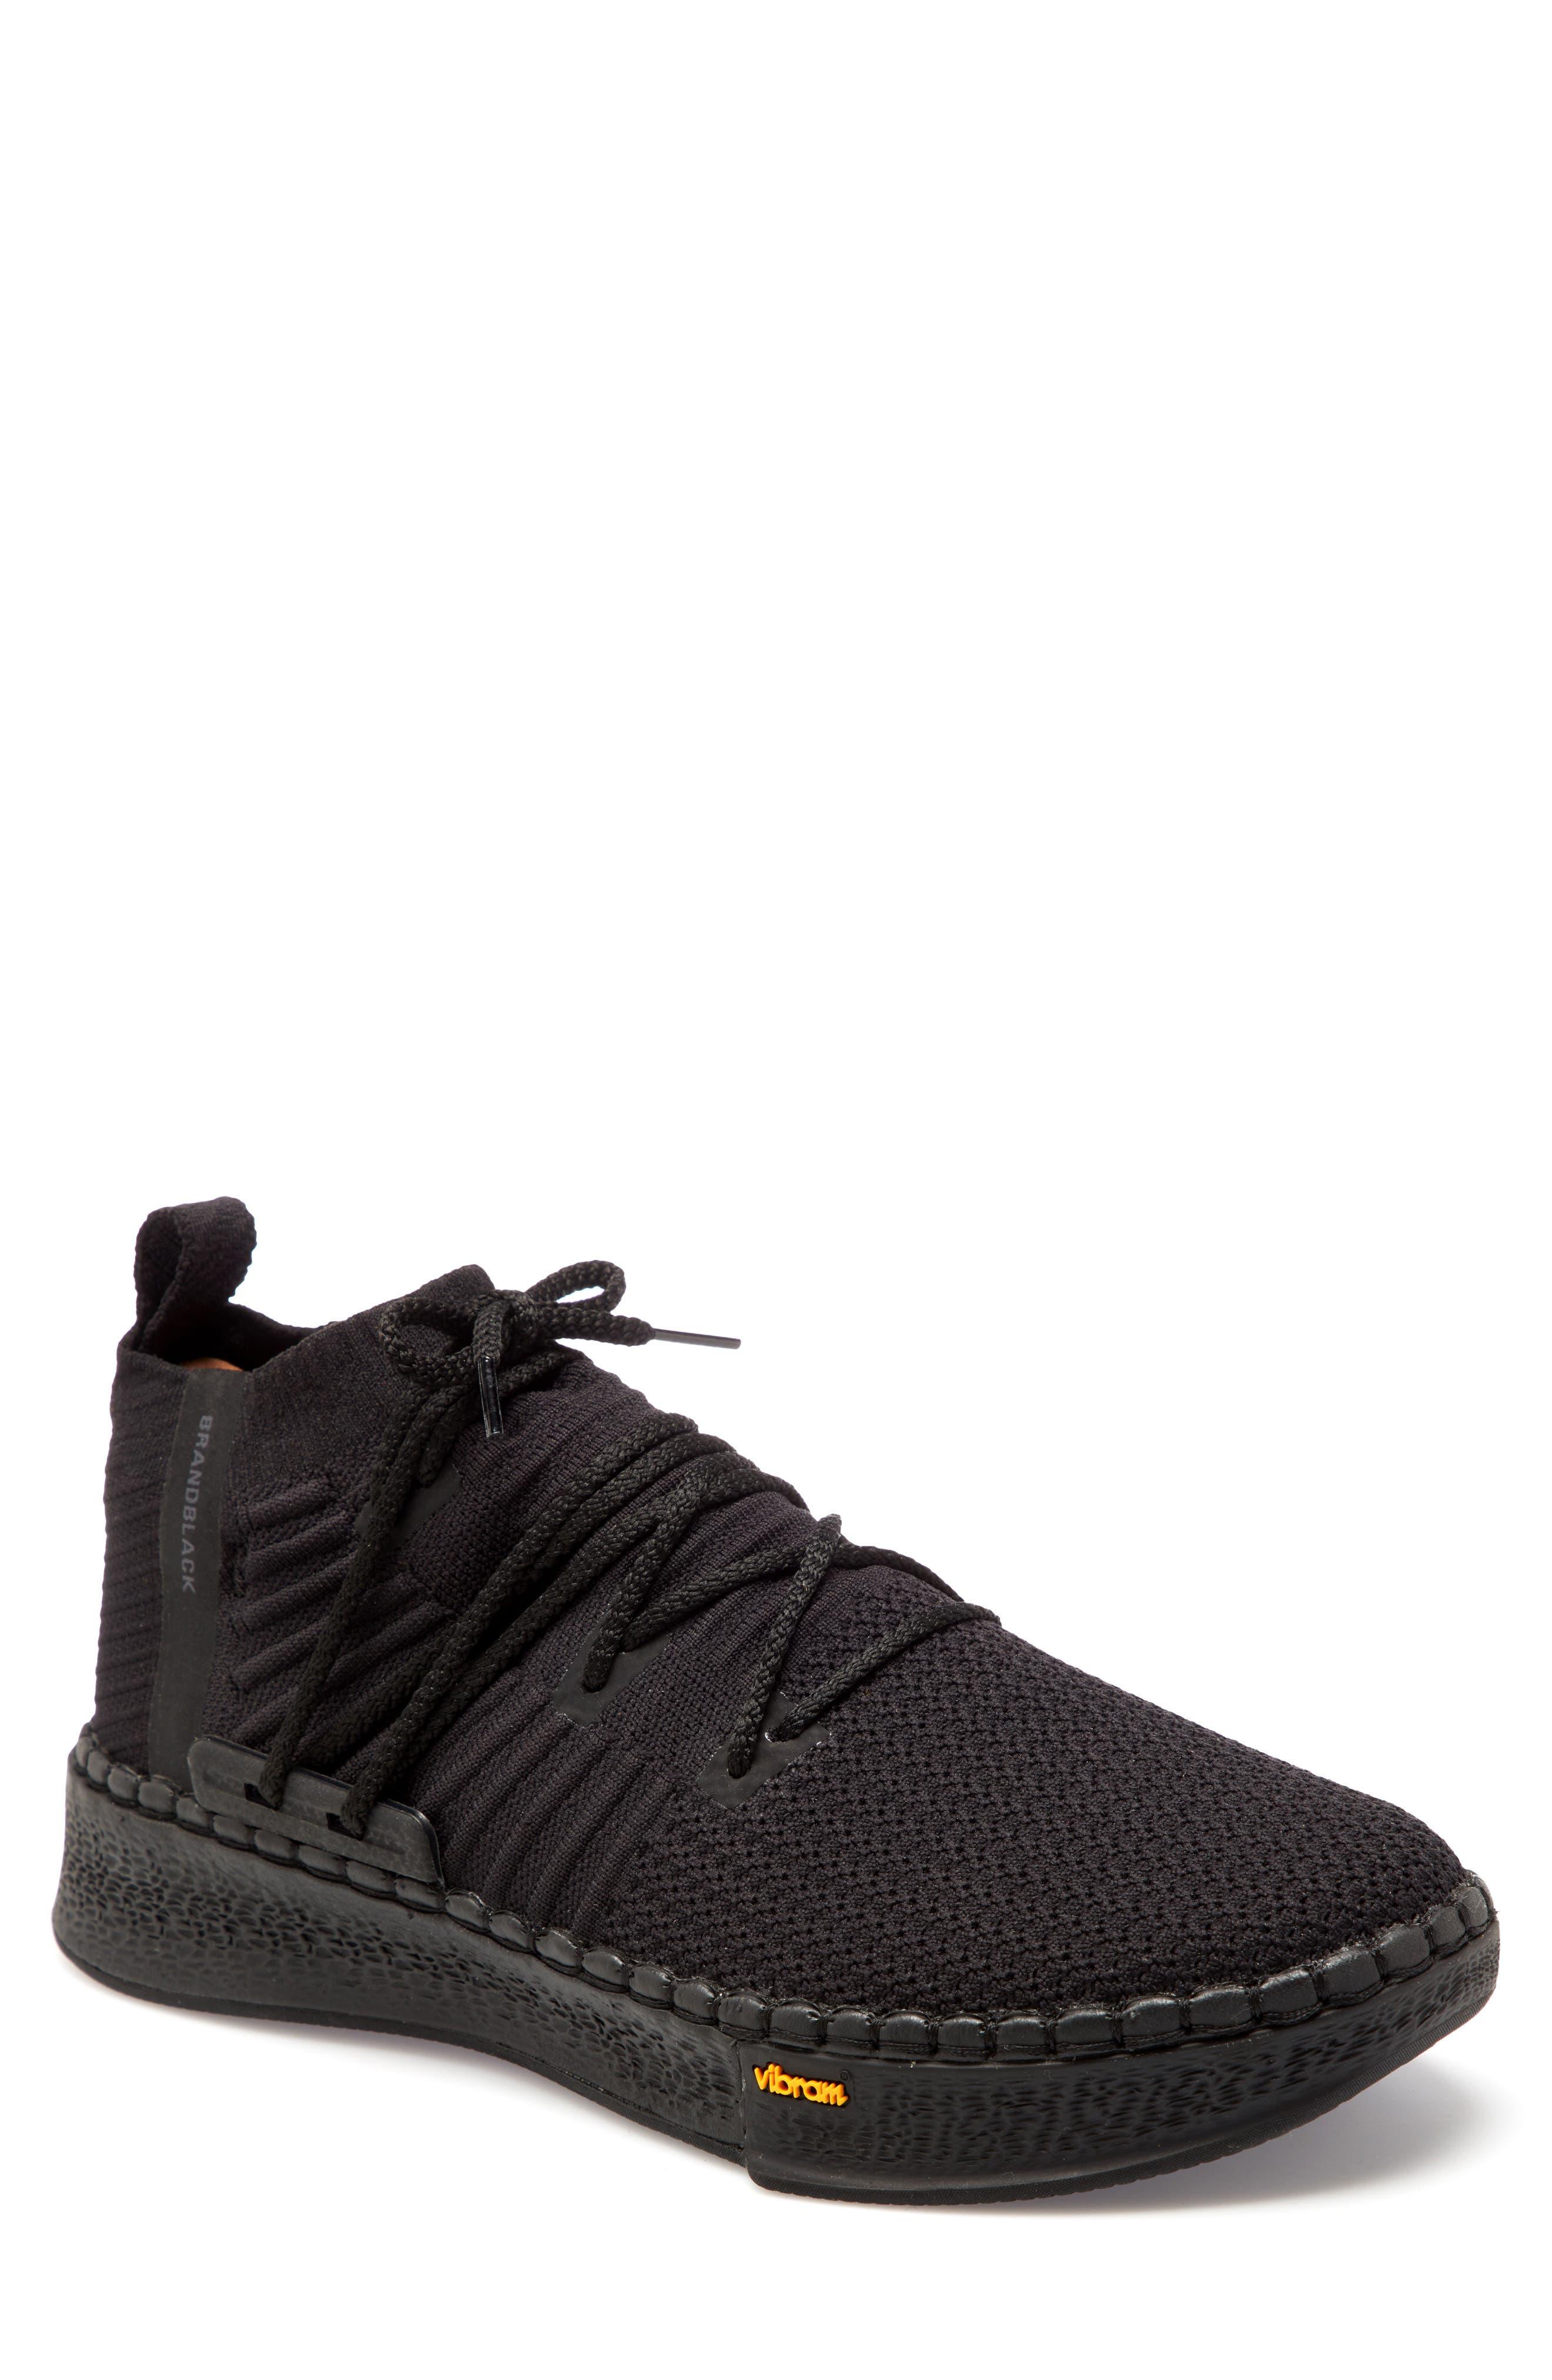 Delta Sneaker,                         Main,                         color, Black